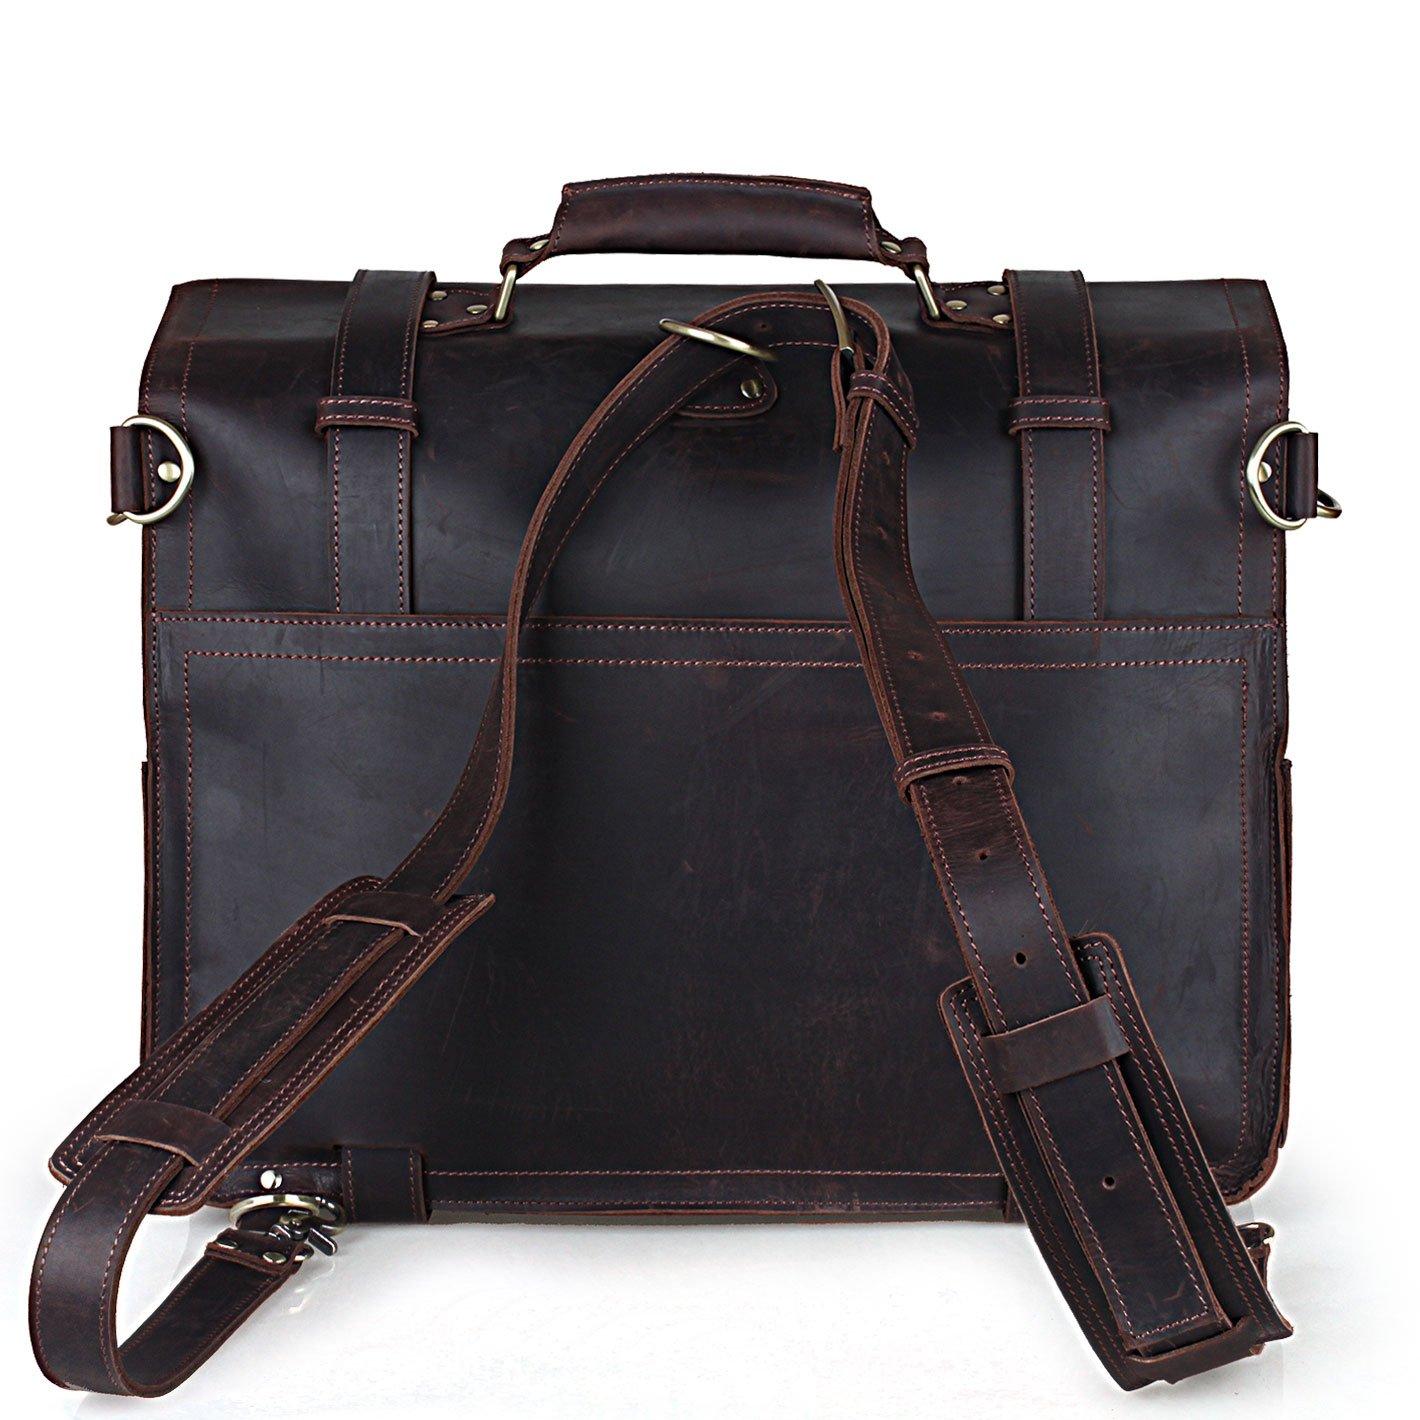 BAIGIO Vintage Leather Luggage Backpack Briefcase Travel Carryon Shoulder Bag (Dark Brown) by BAIGIO (Image #2)